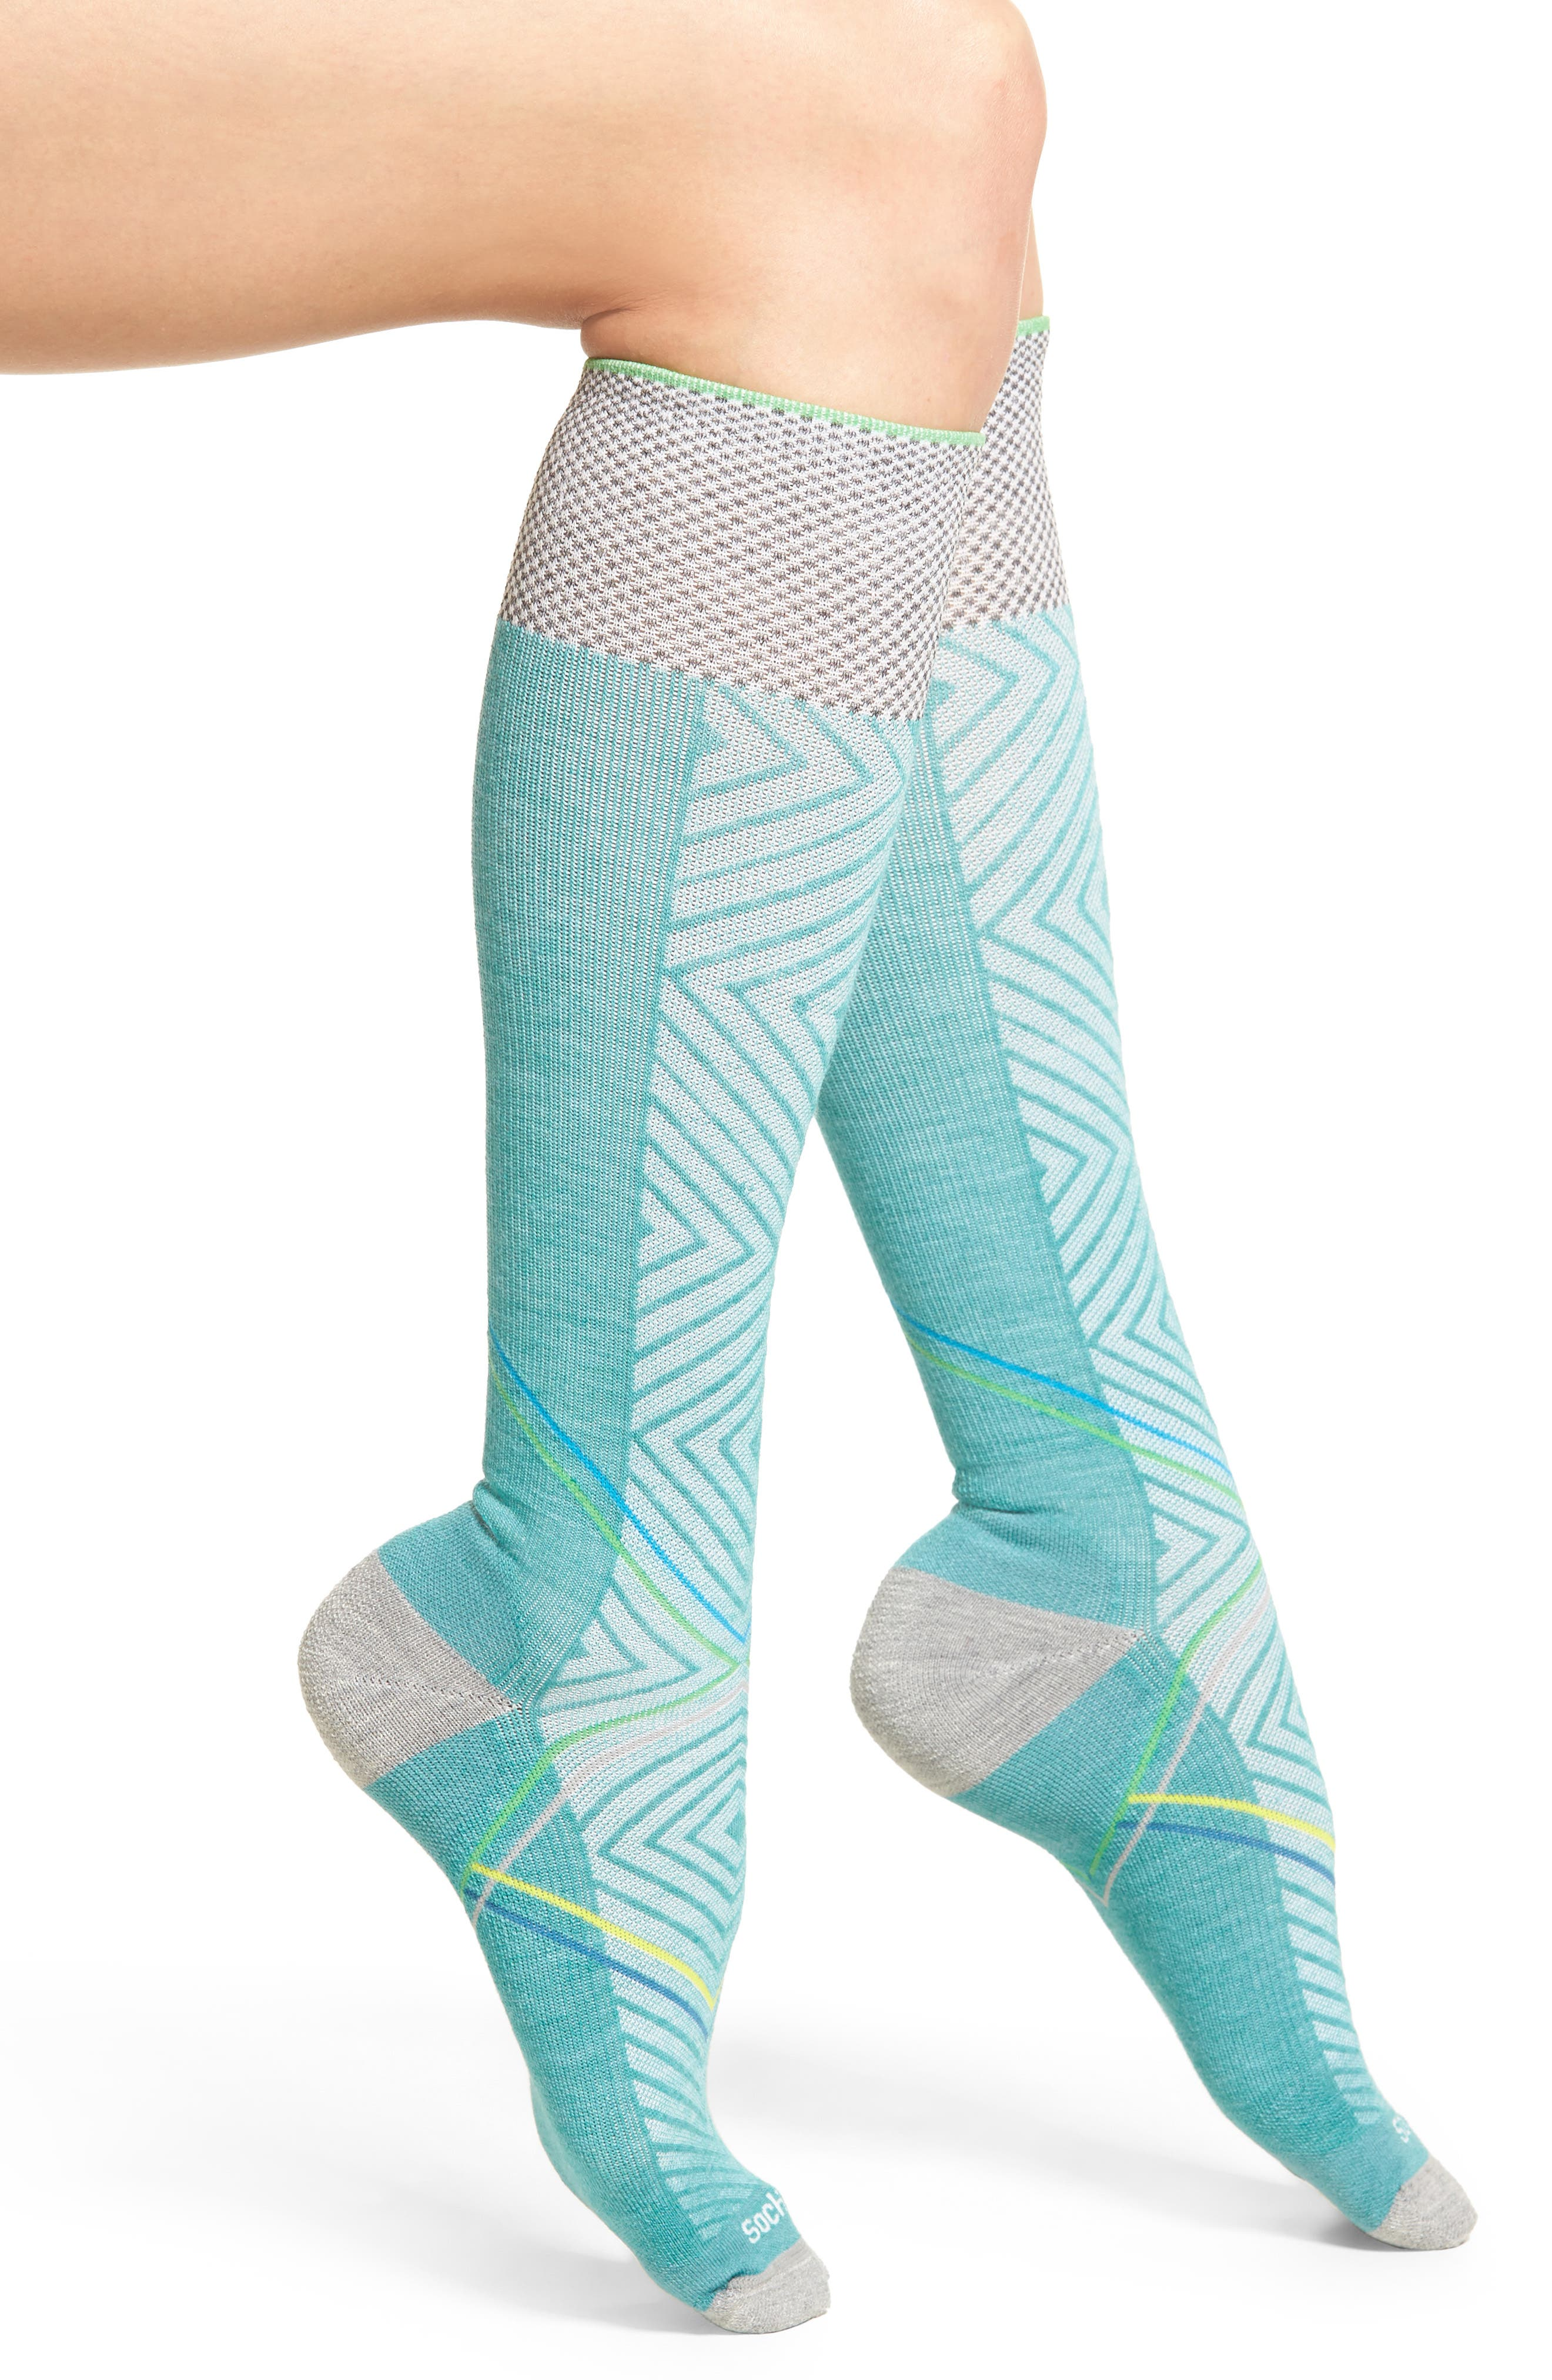 Pulse Compression Knee Socks,                             Main thumbnail 1, color,                             330